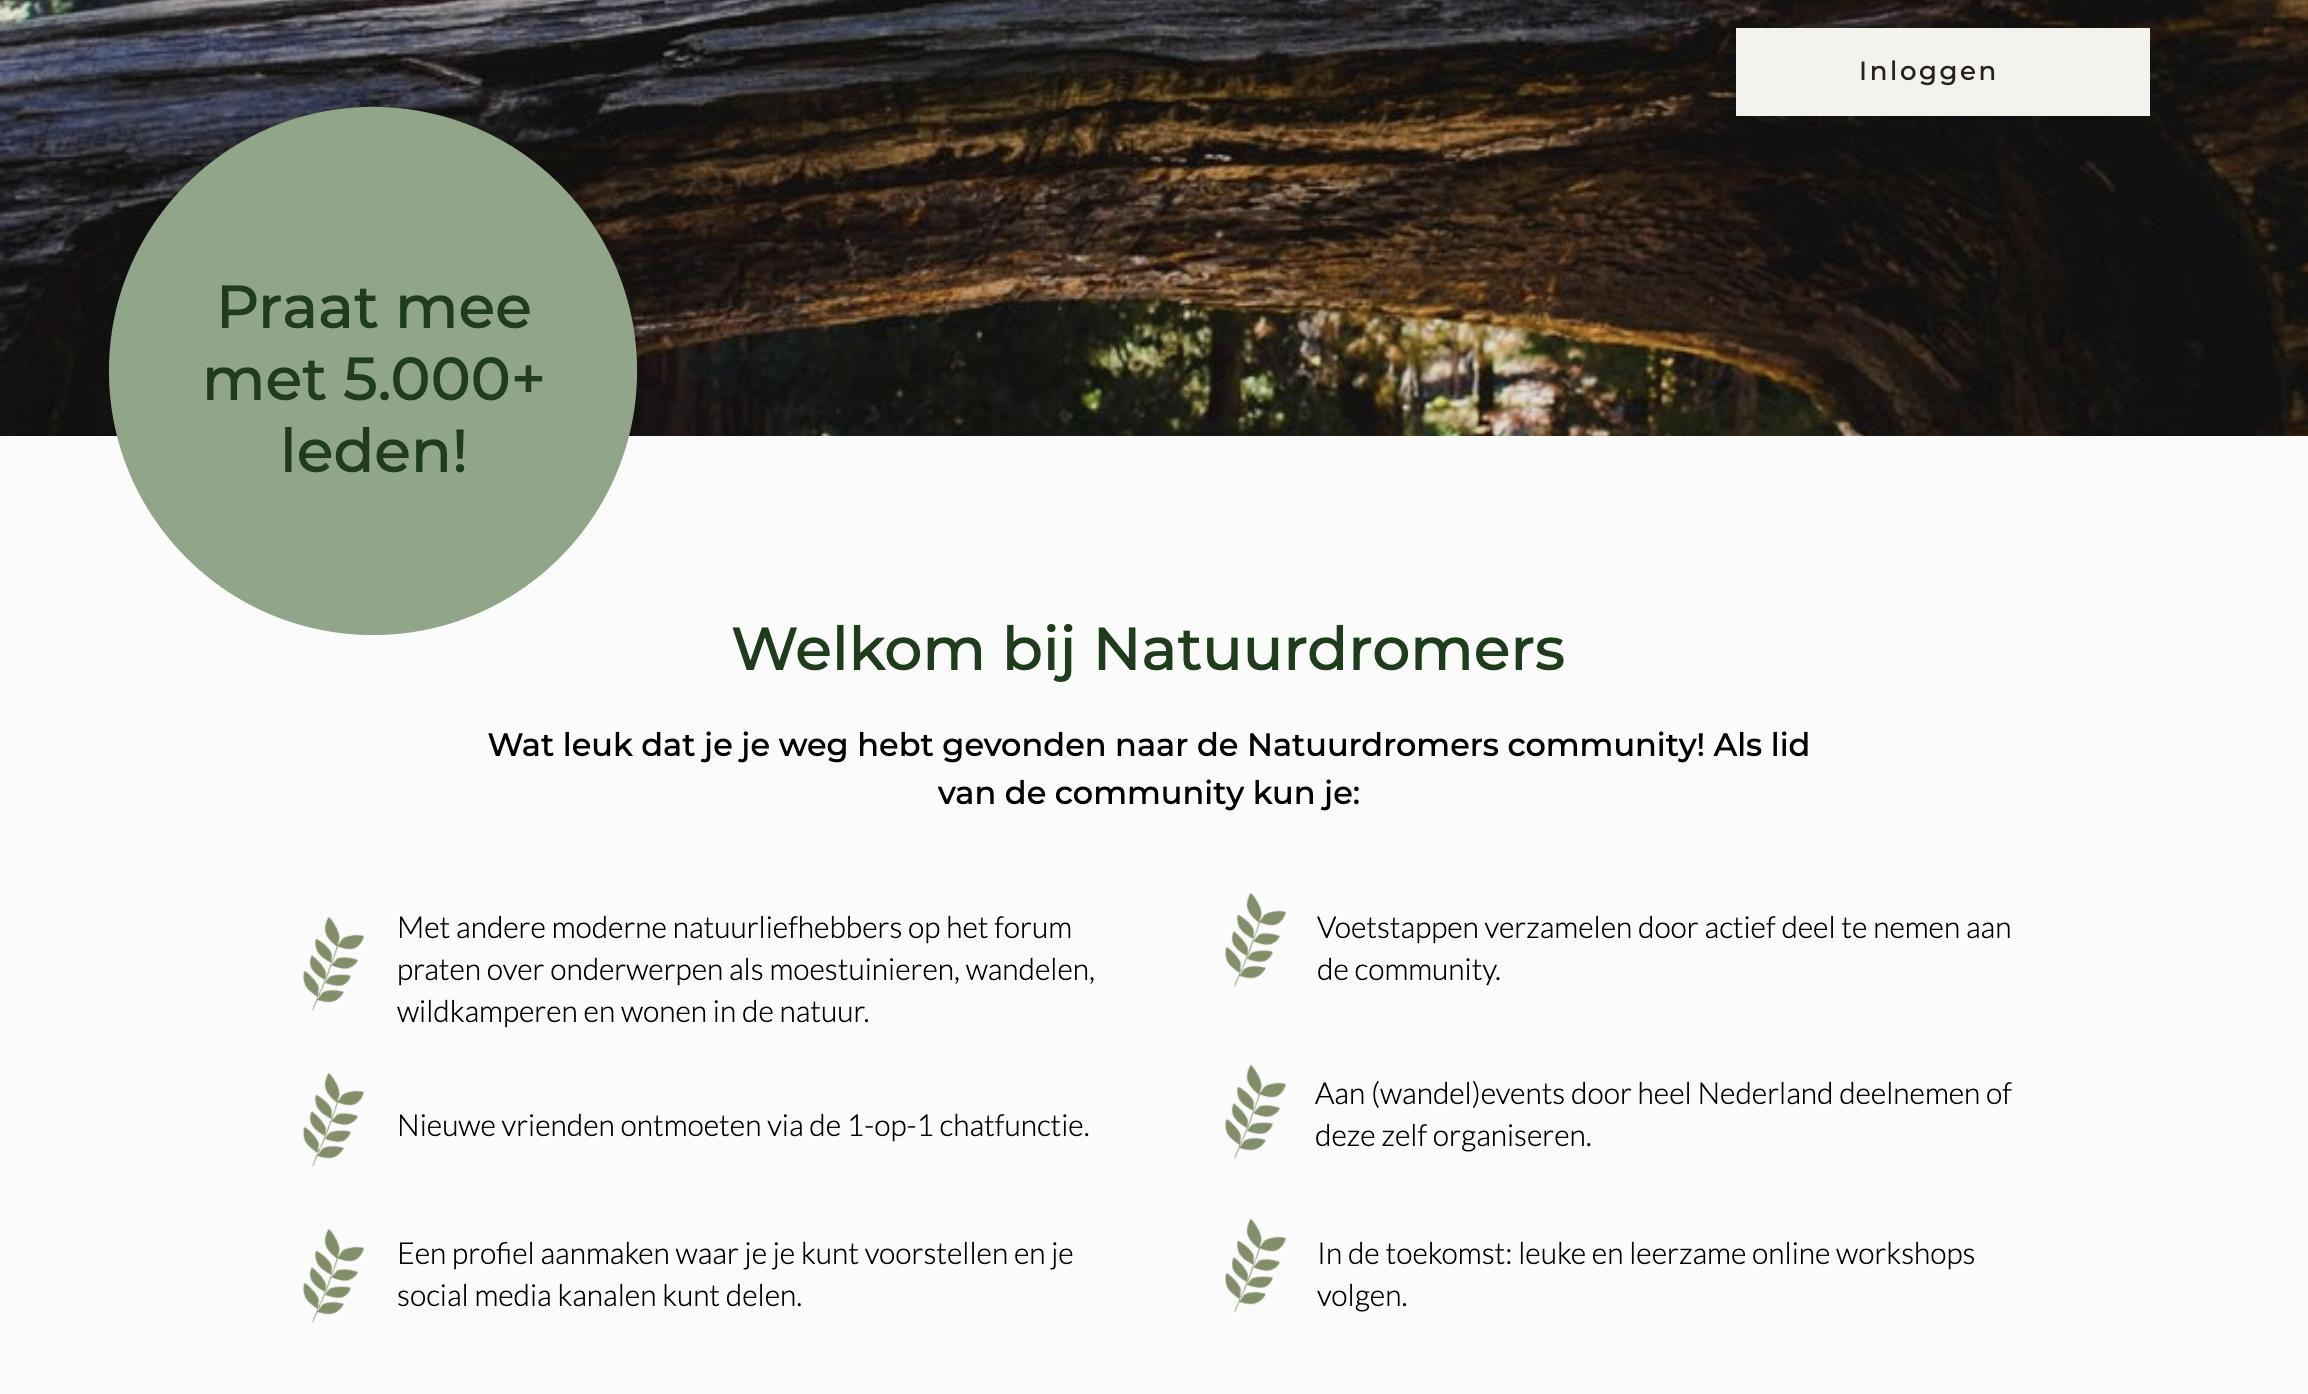 Natuurdromers.nl